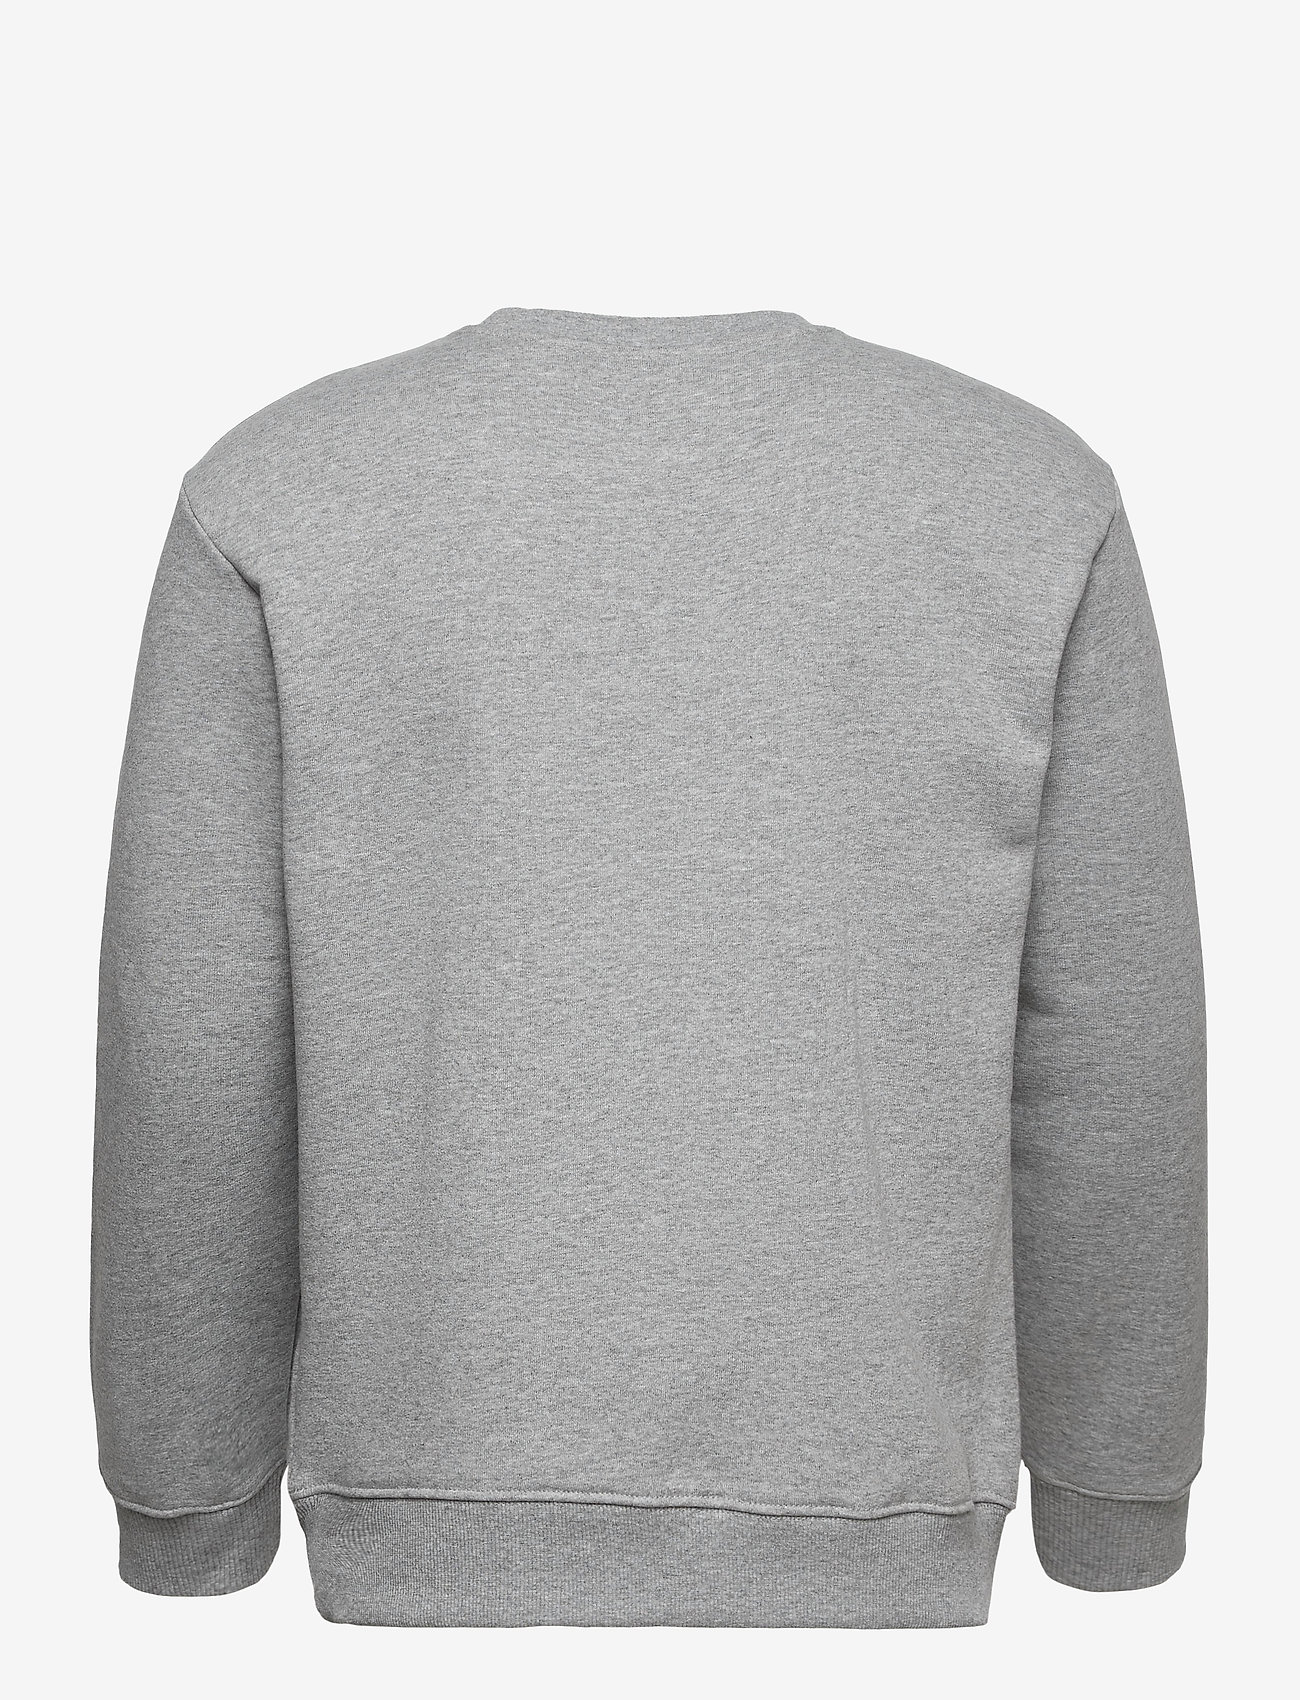 Lee Jeans - BASIC CREW LOGO SWS - tops - grey mele - 1